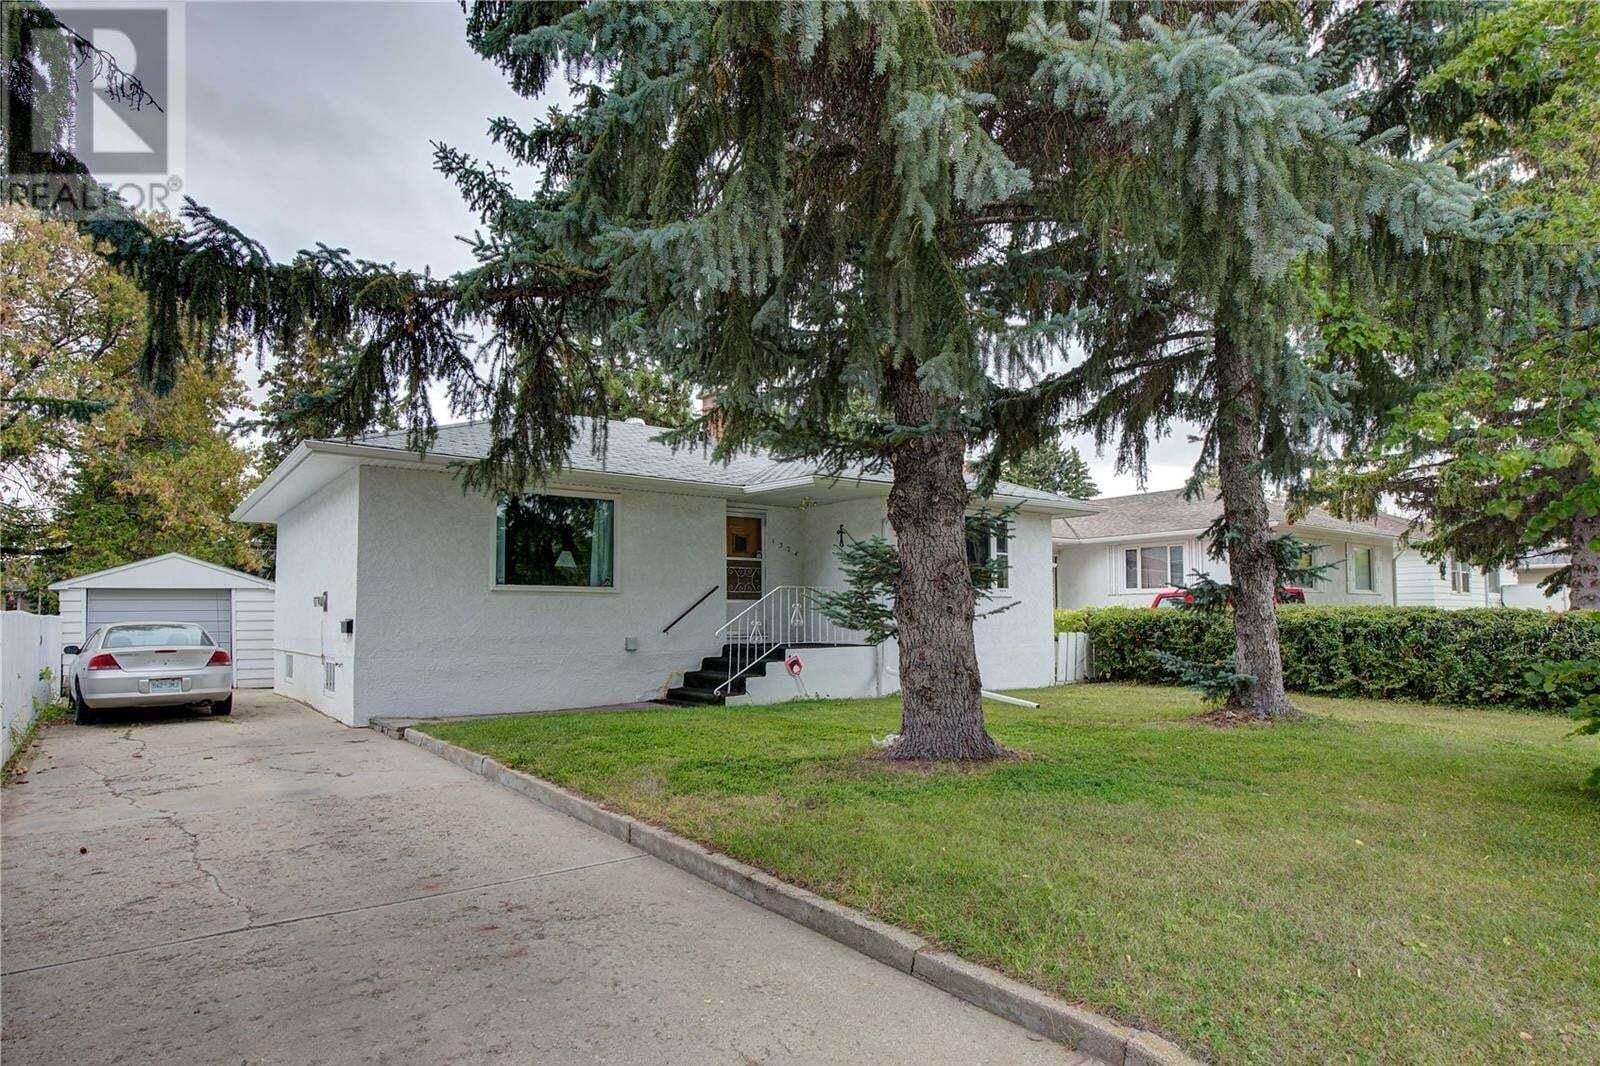 House for sale at 1324 14th St E Saskatoon Saskatchewan - MLS: SK827919